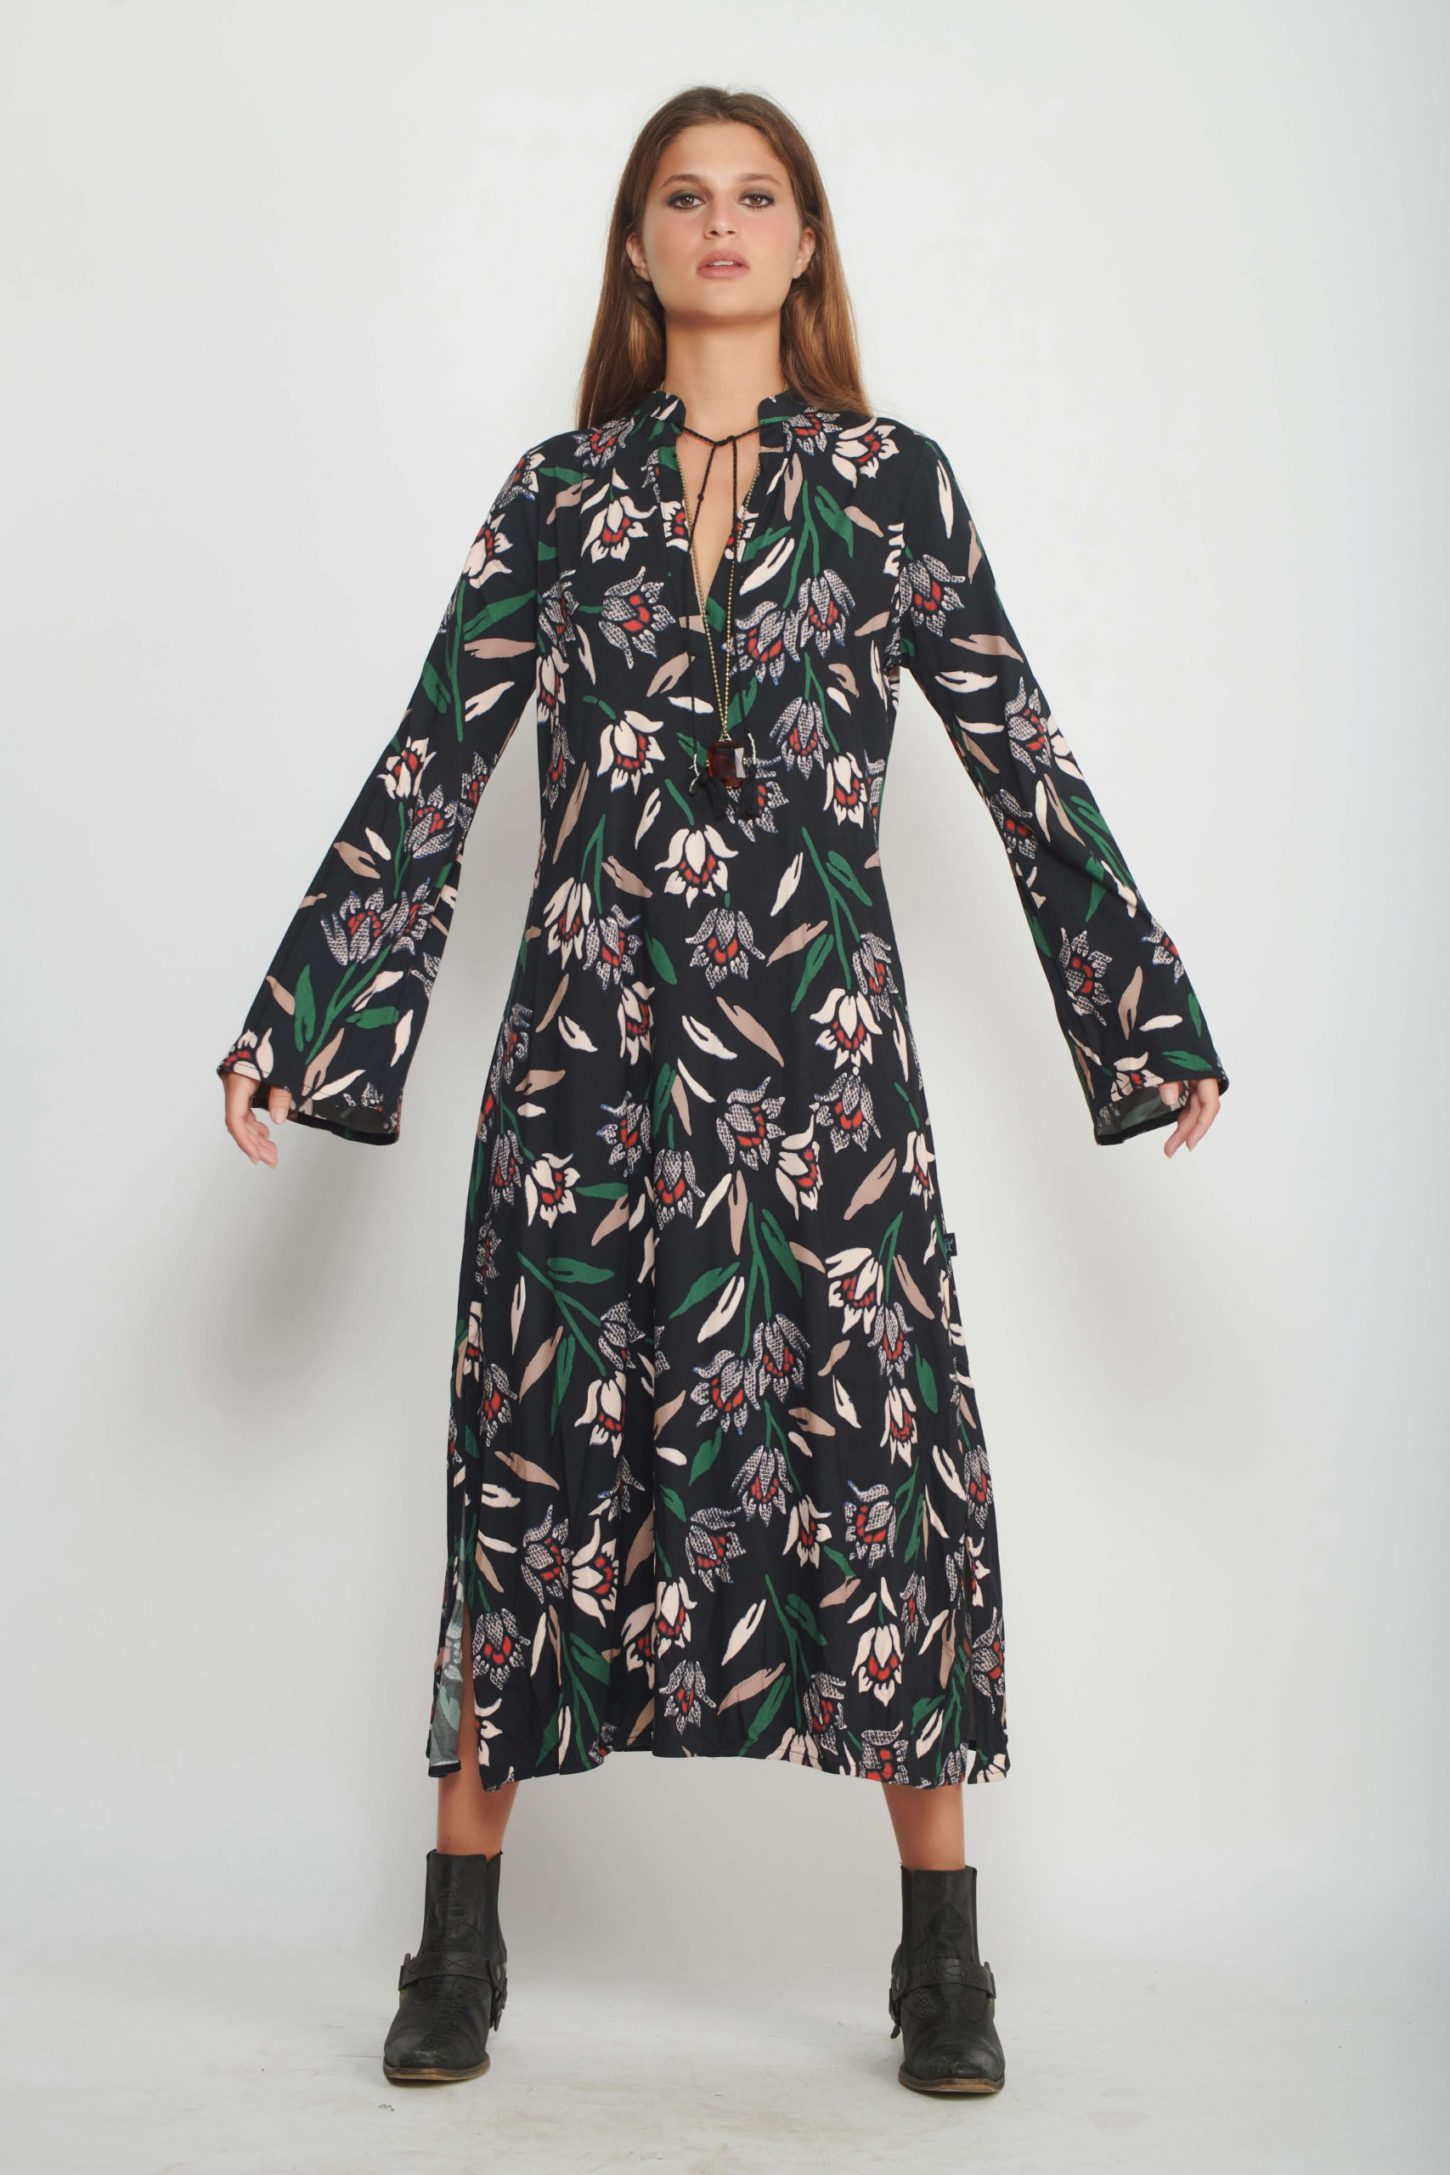 Mattis Dress for Women